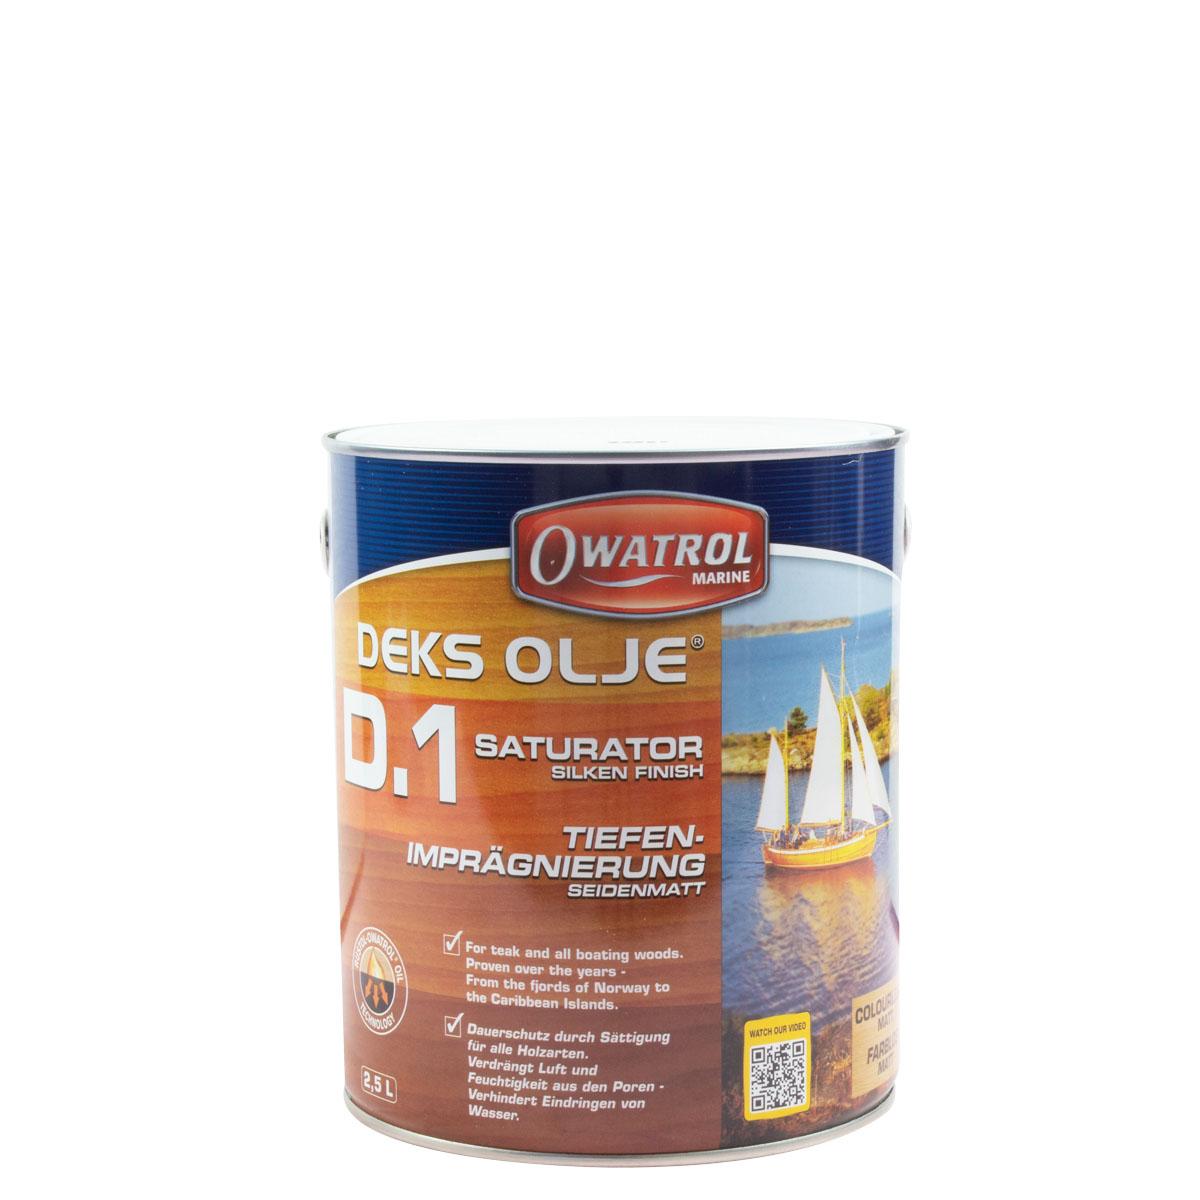 Owatrol Deks Olje D1 2,5L tiefenimprägnierung, seidenmatt